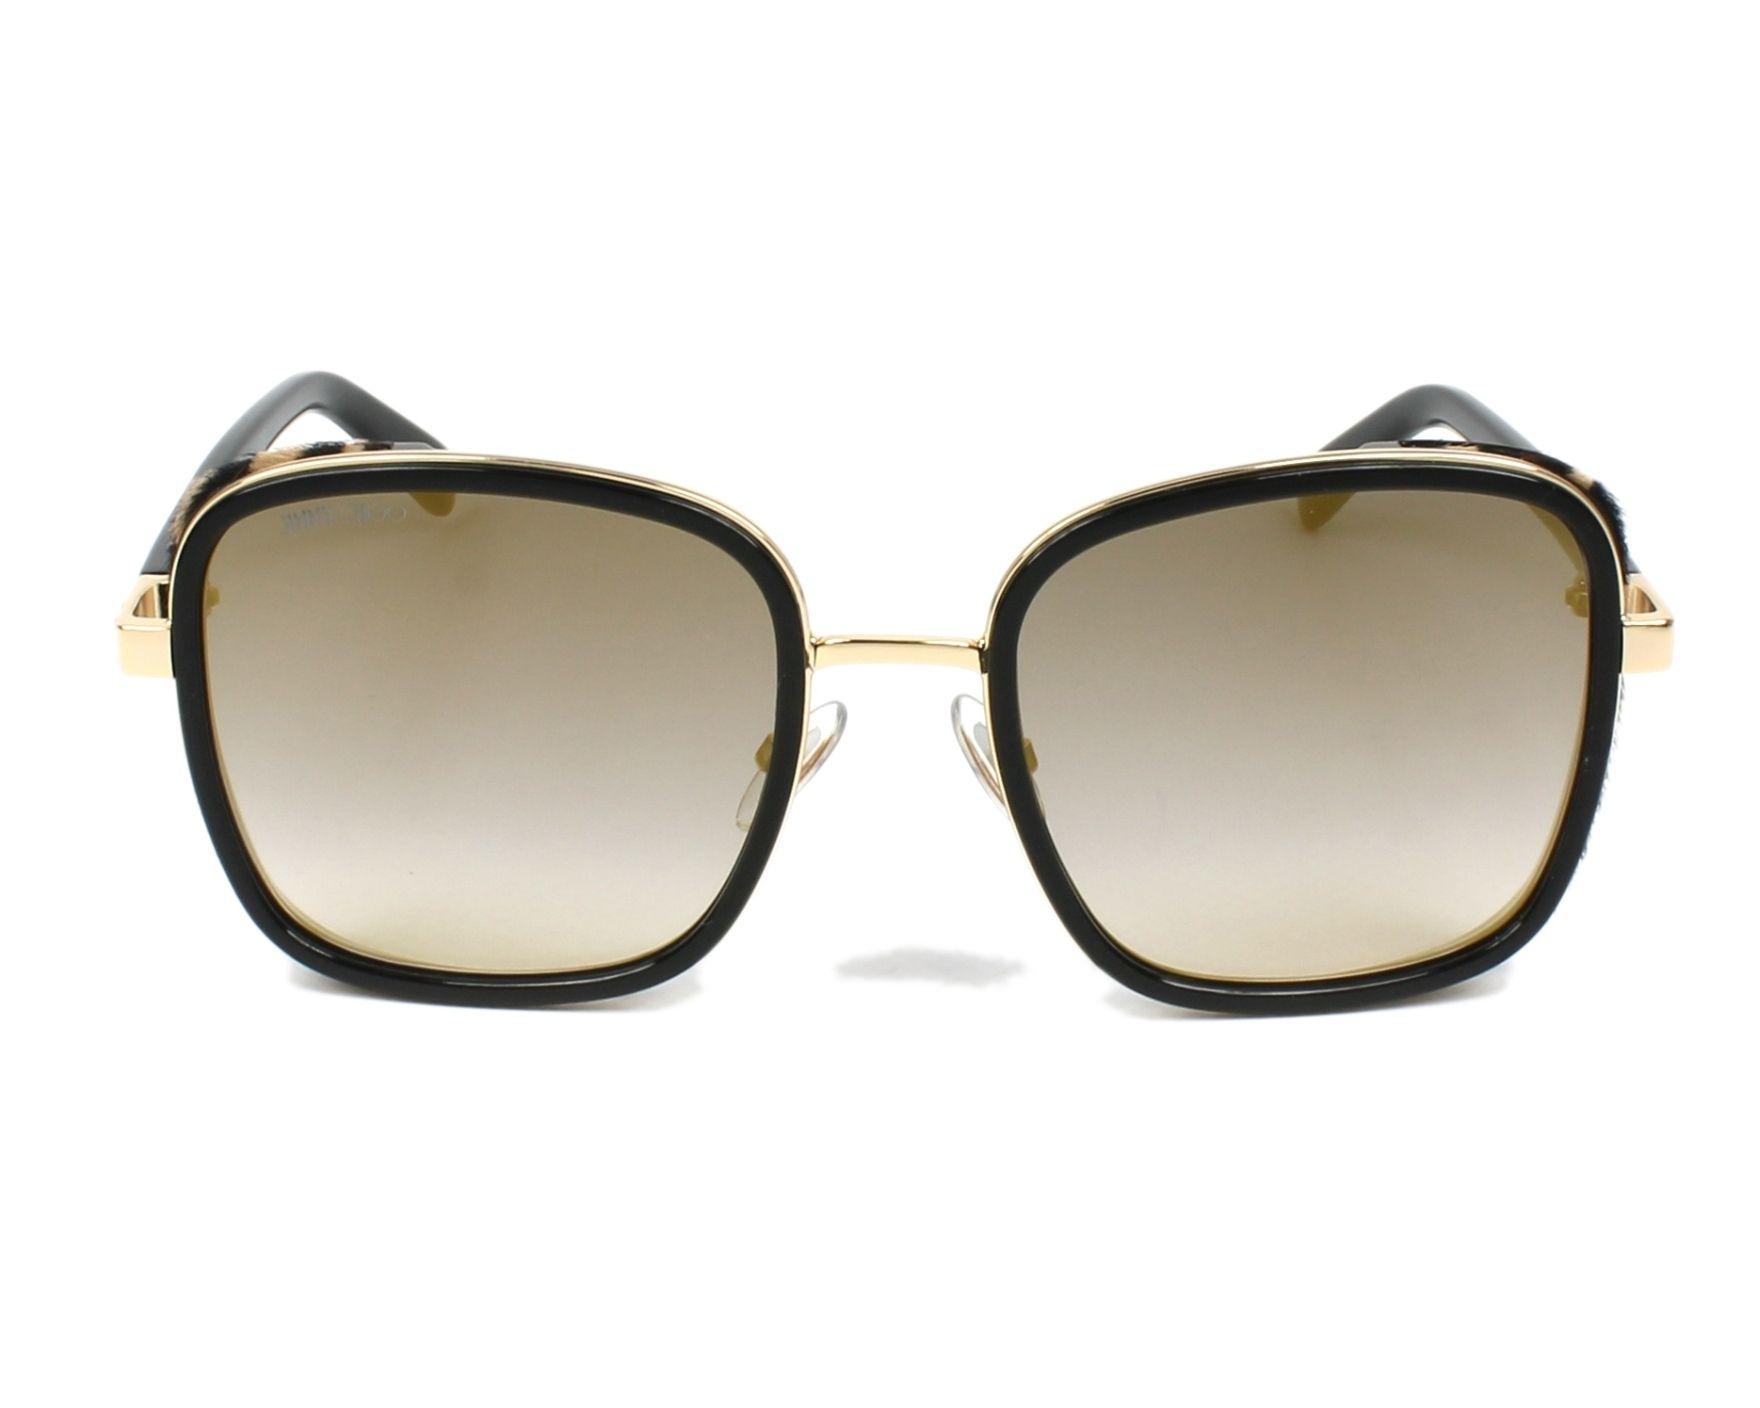 cdc3d645c6b1 thumbnail Sunglasses Jimmy Choo ELVA-S FP3 FQ - Black Leo front view